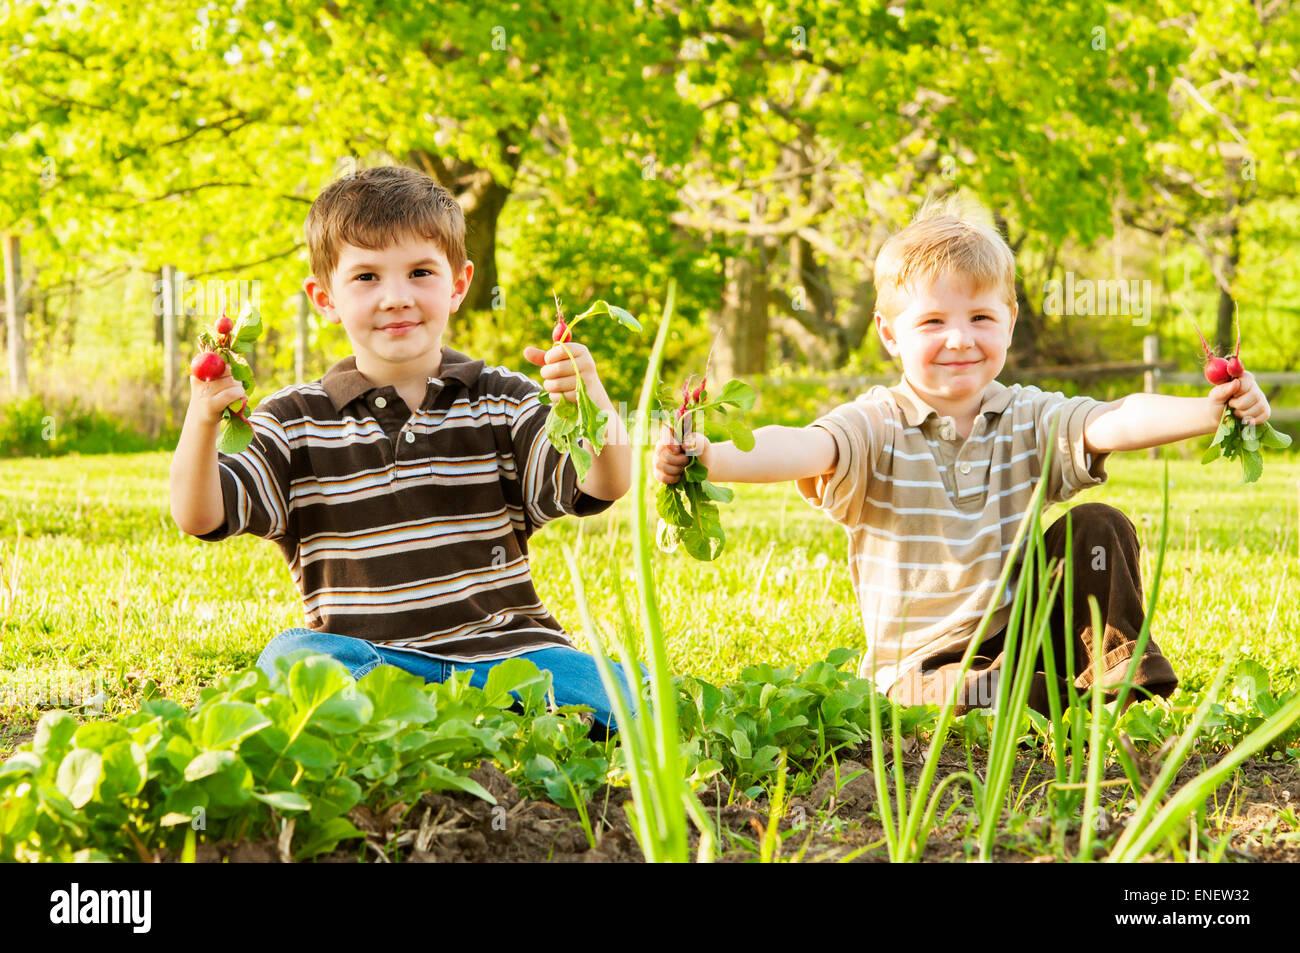 Children holding radishes picked from Spring garden - Stock Image